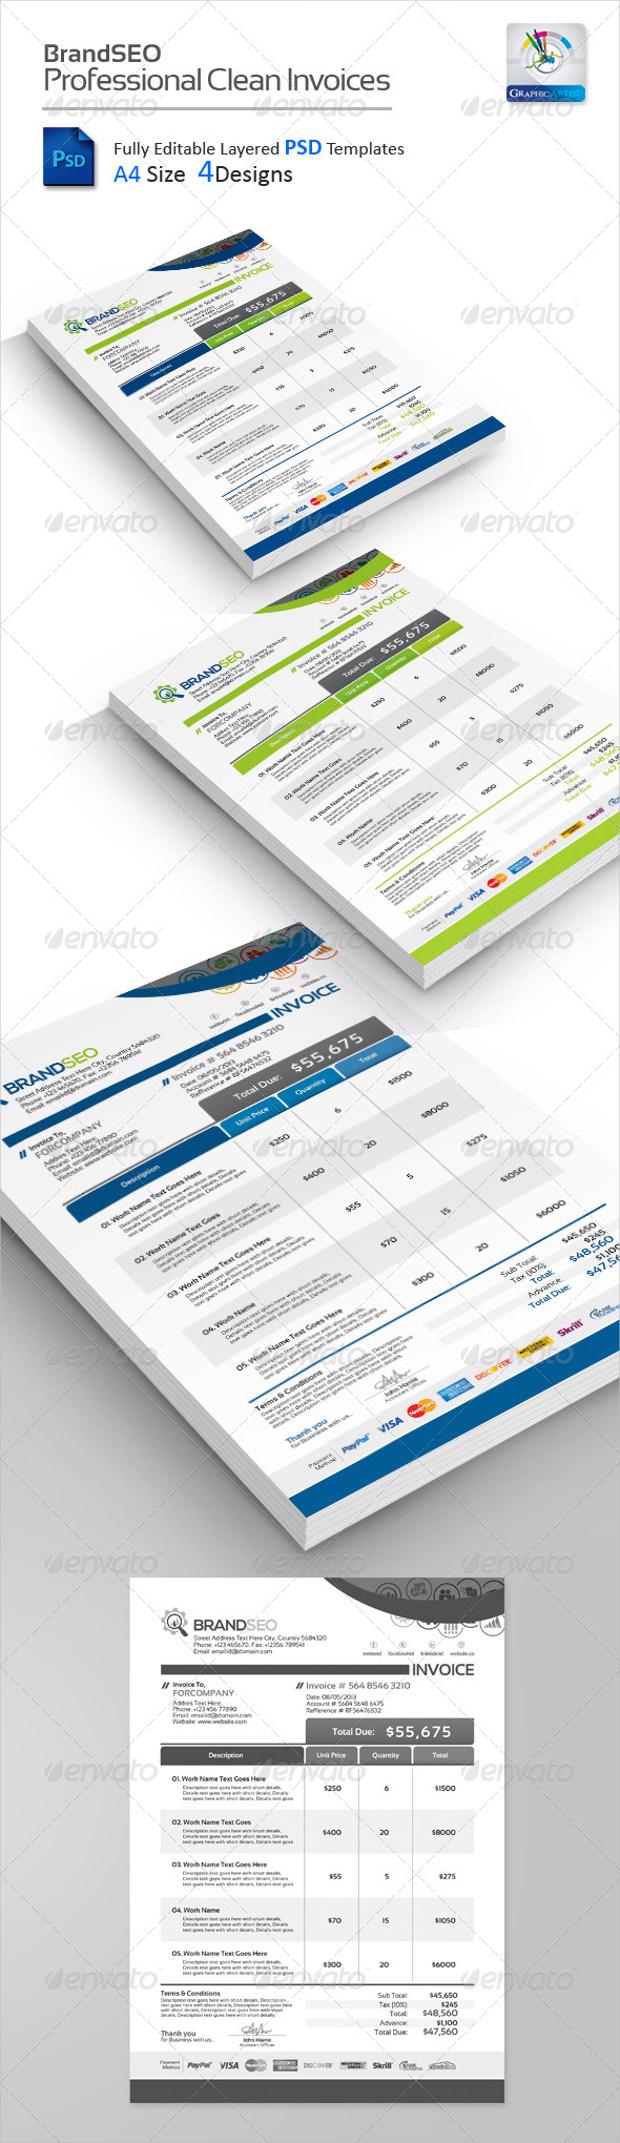 BrandSEO Creative PSD Invoices